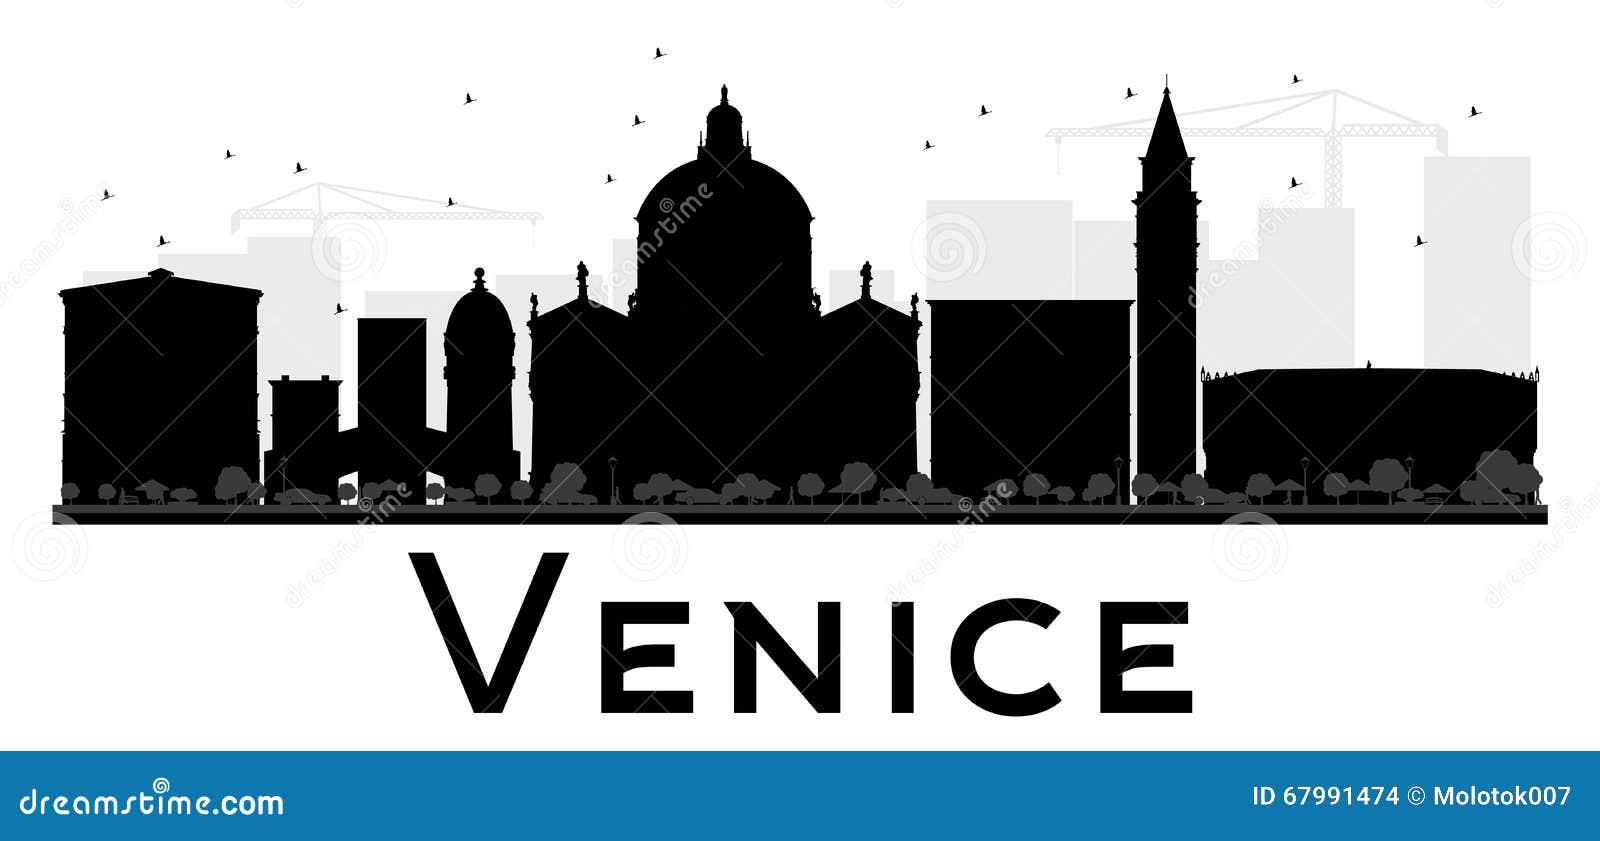 Venice city skyline black and white silhouette stock for Illustration minimaliste